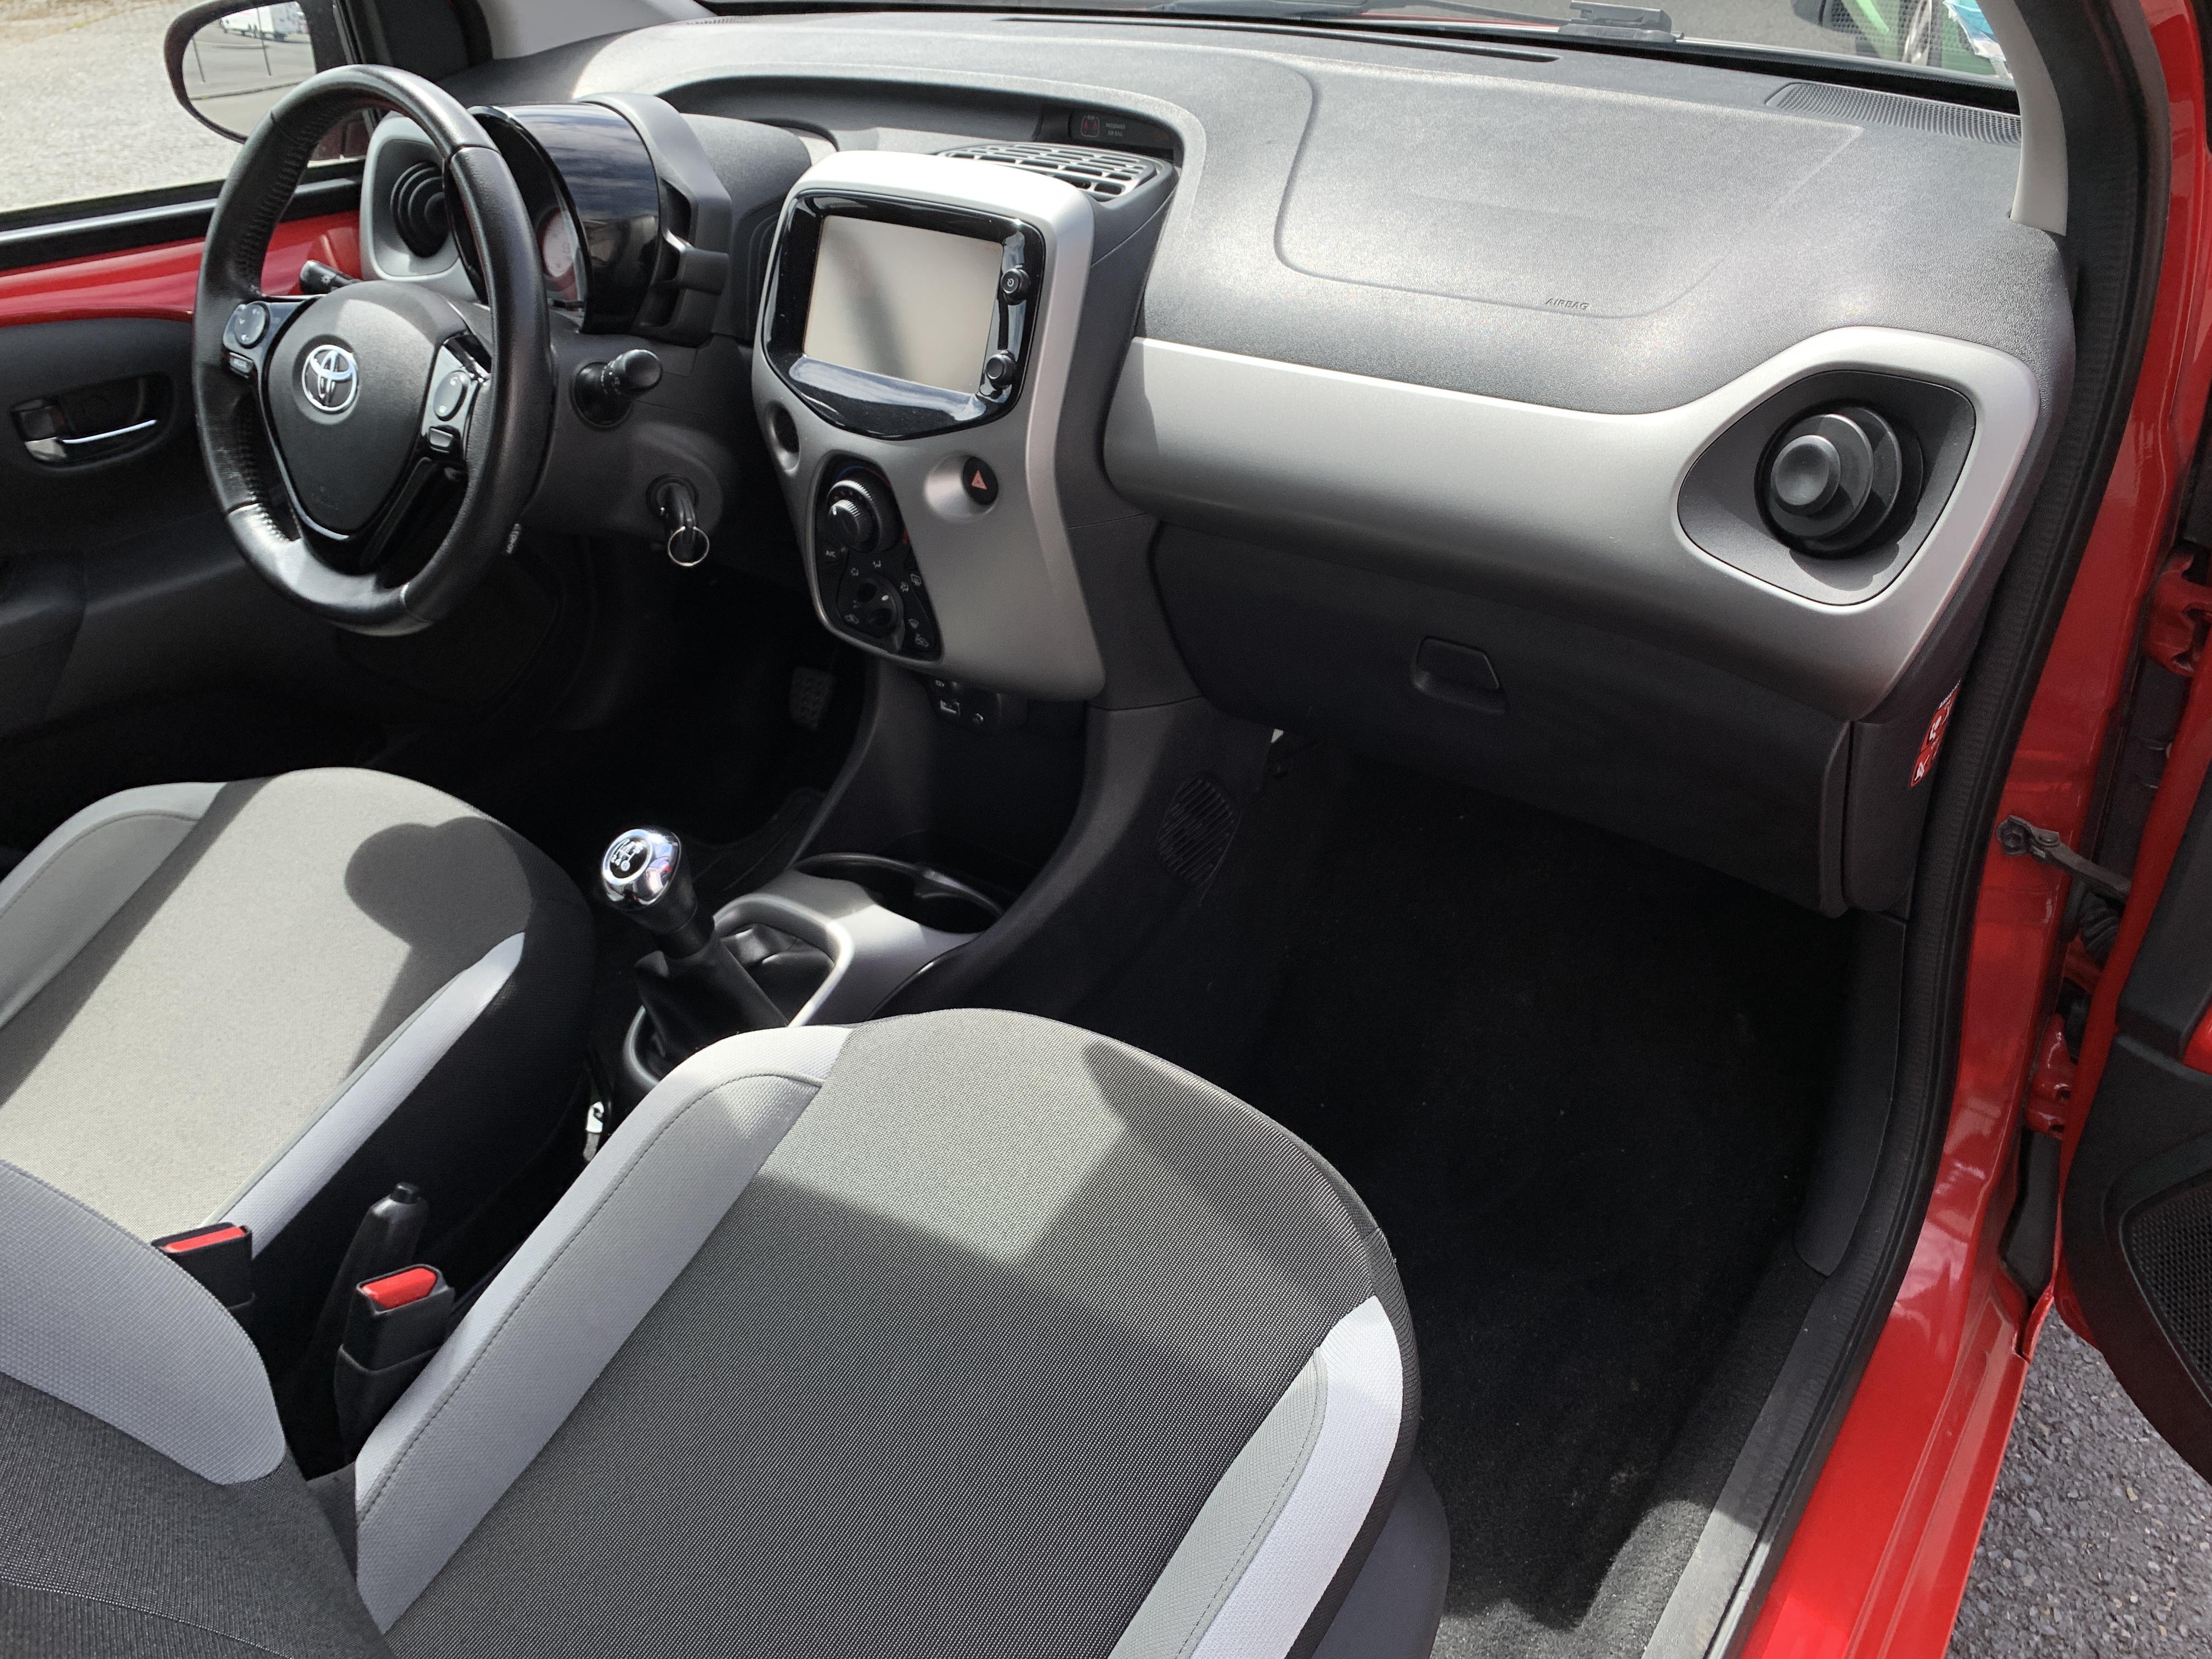 photo_Toyota Aygo 1.0 VVTi 69 CH X-PLAY - GARANTIE 6 MOIS, Carslift